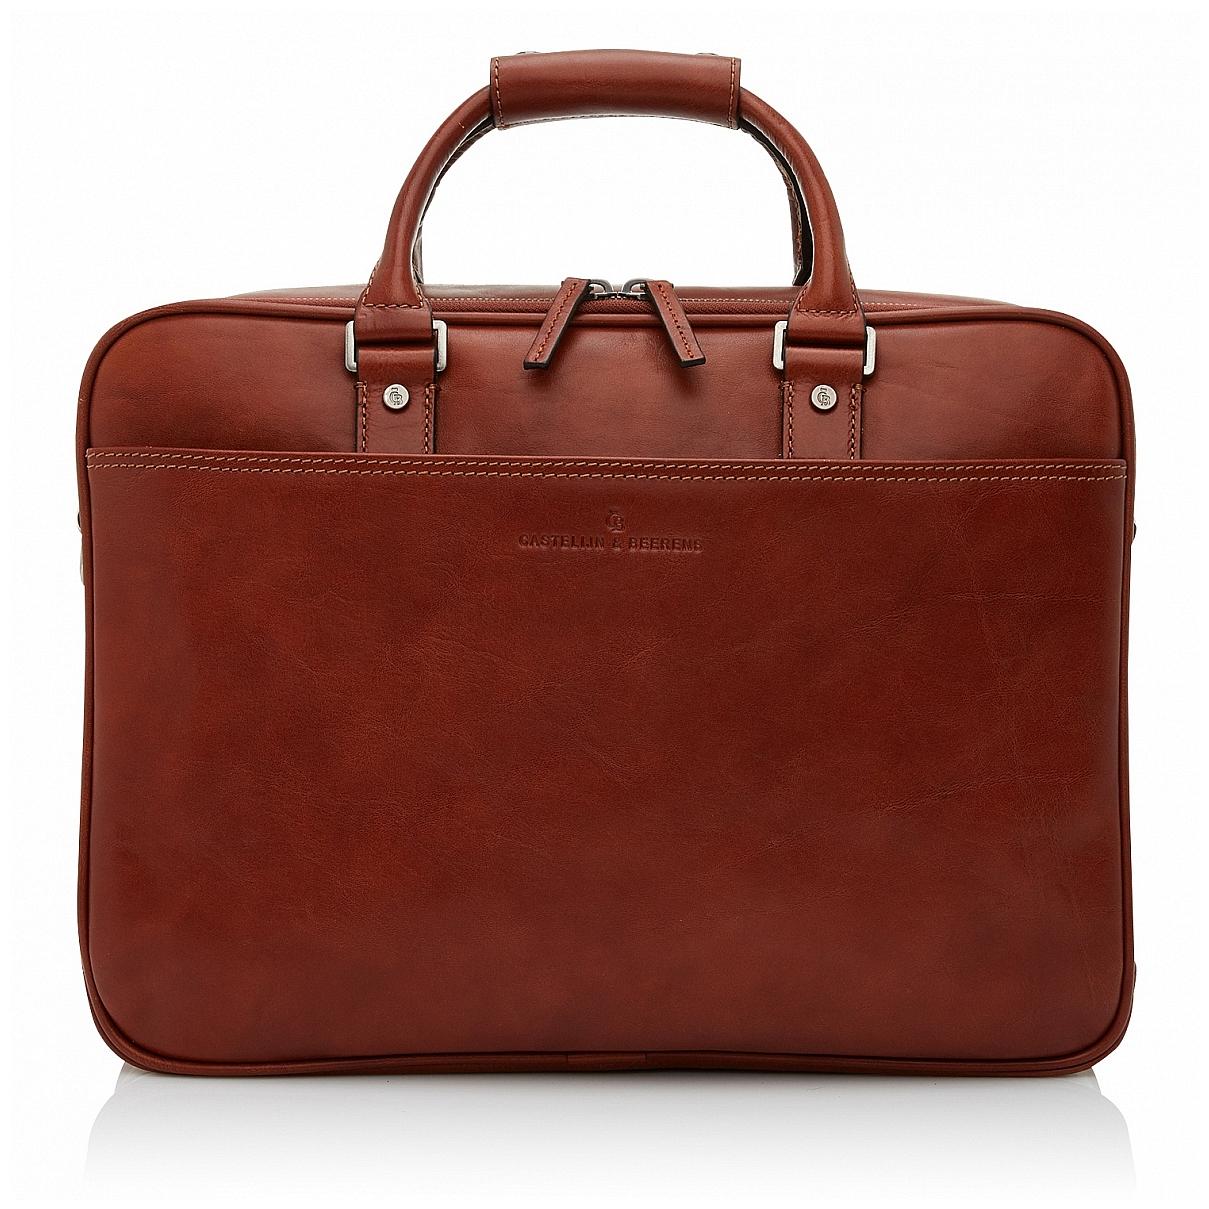 Castelijn & Beerens Kožená taška na notebook a tablet 689476 hnědá